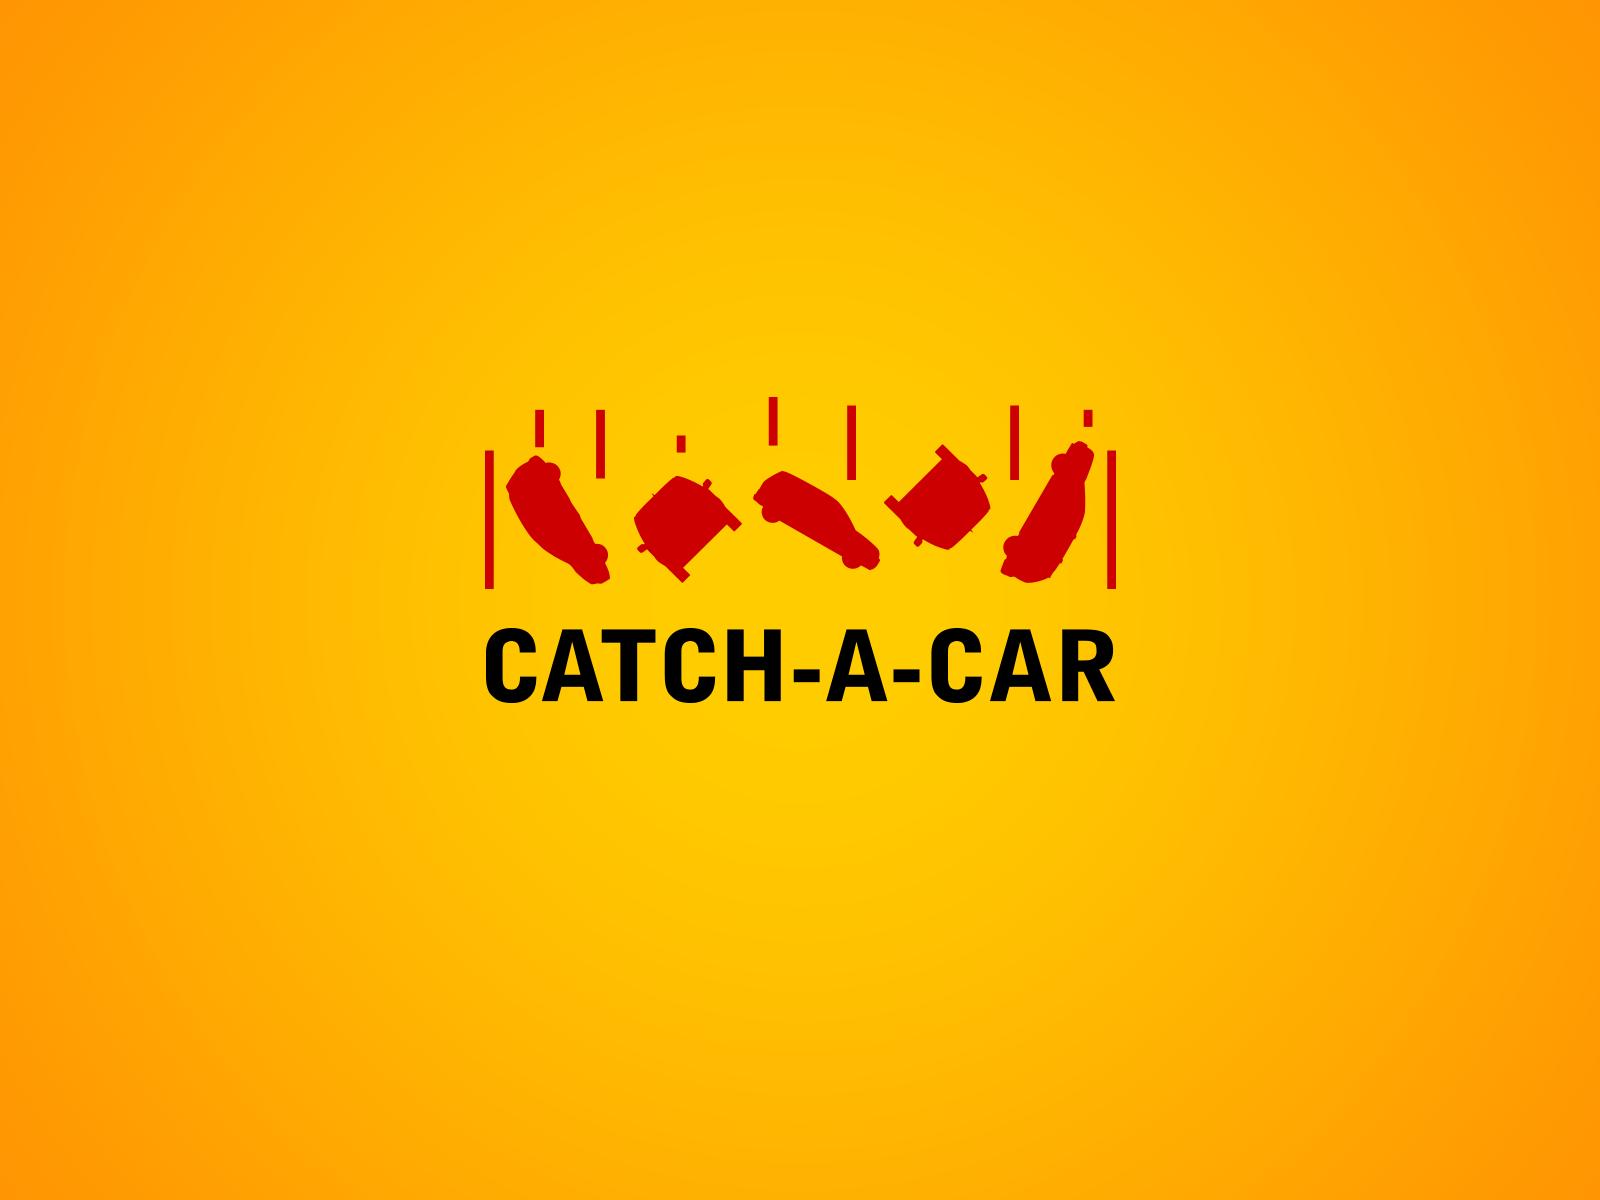 Catch-a-car Logotype / Taxi Service / concept